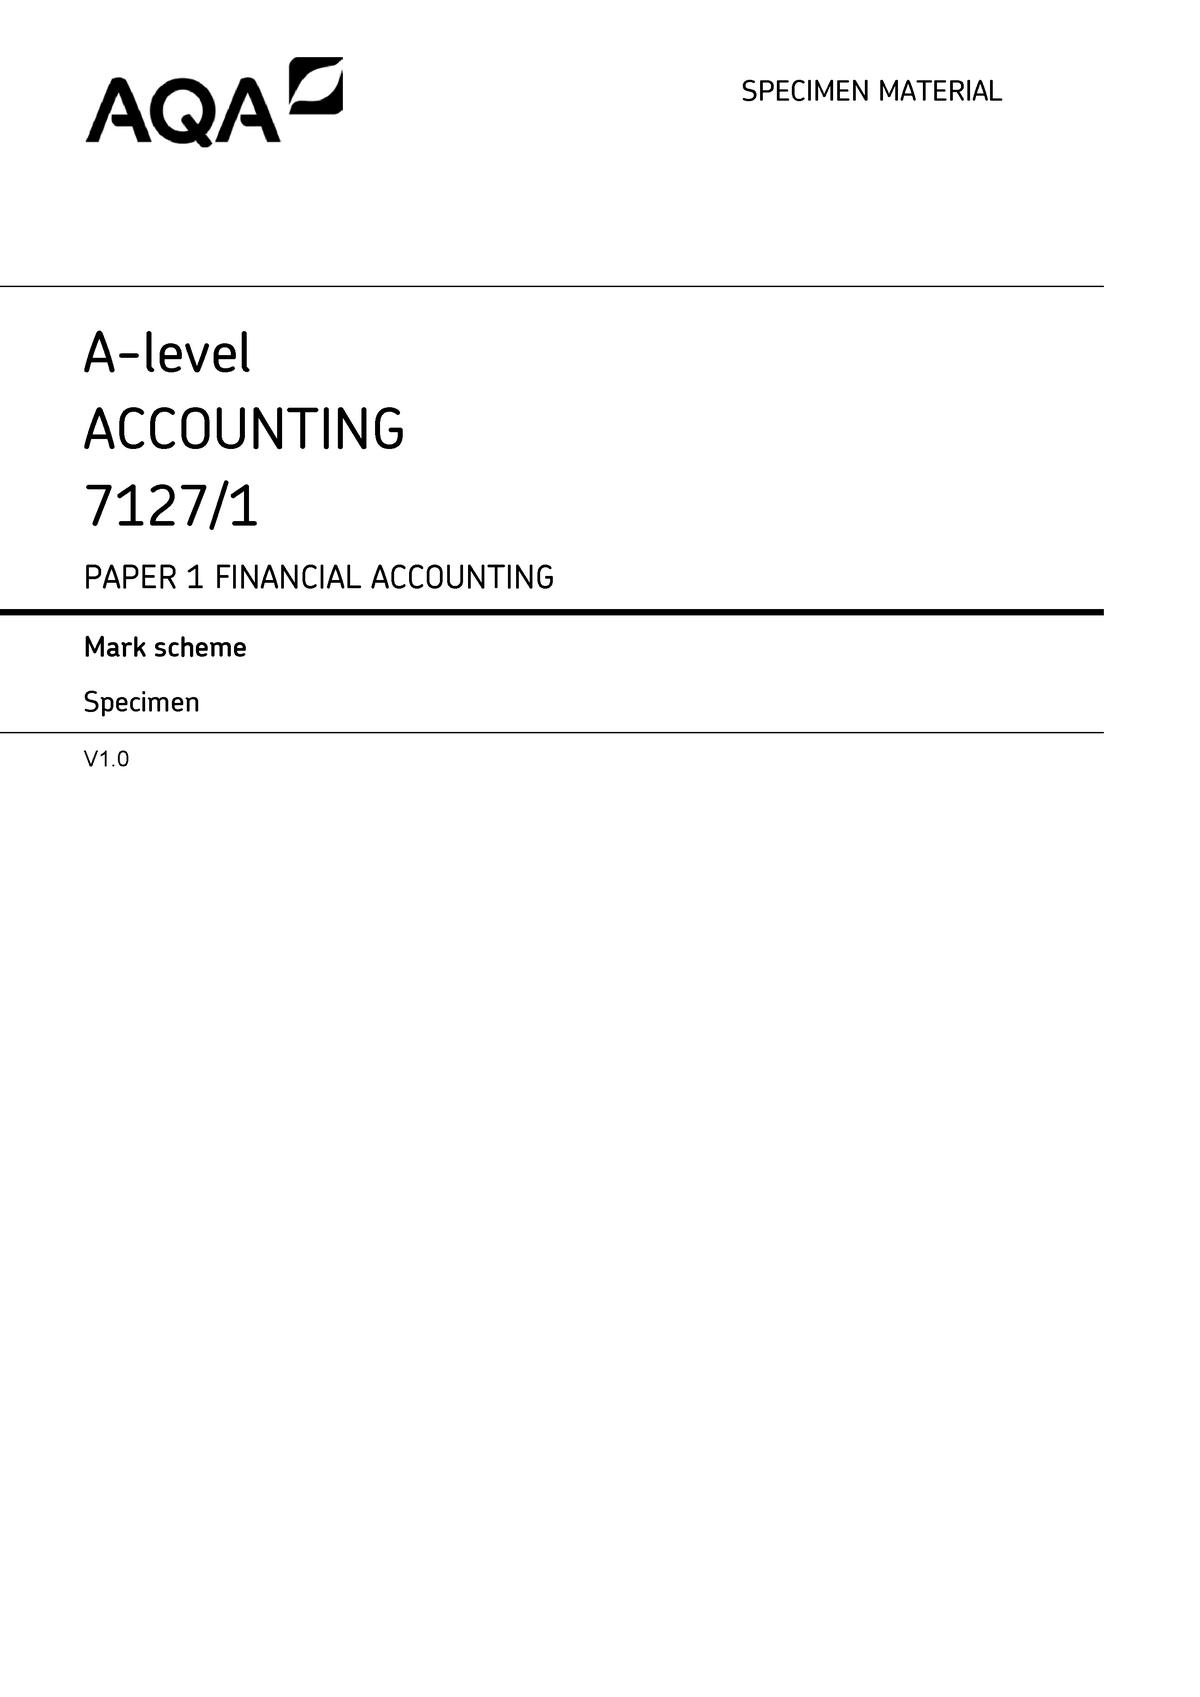 AQA-71271-SMS - aqa - AC 315: Cost Accounting - StuDocu